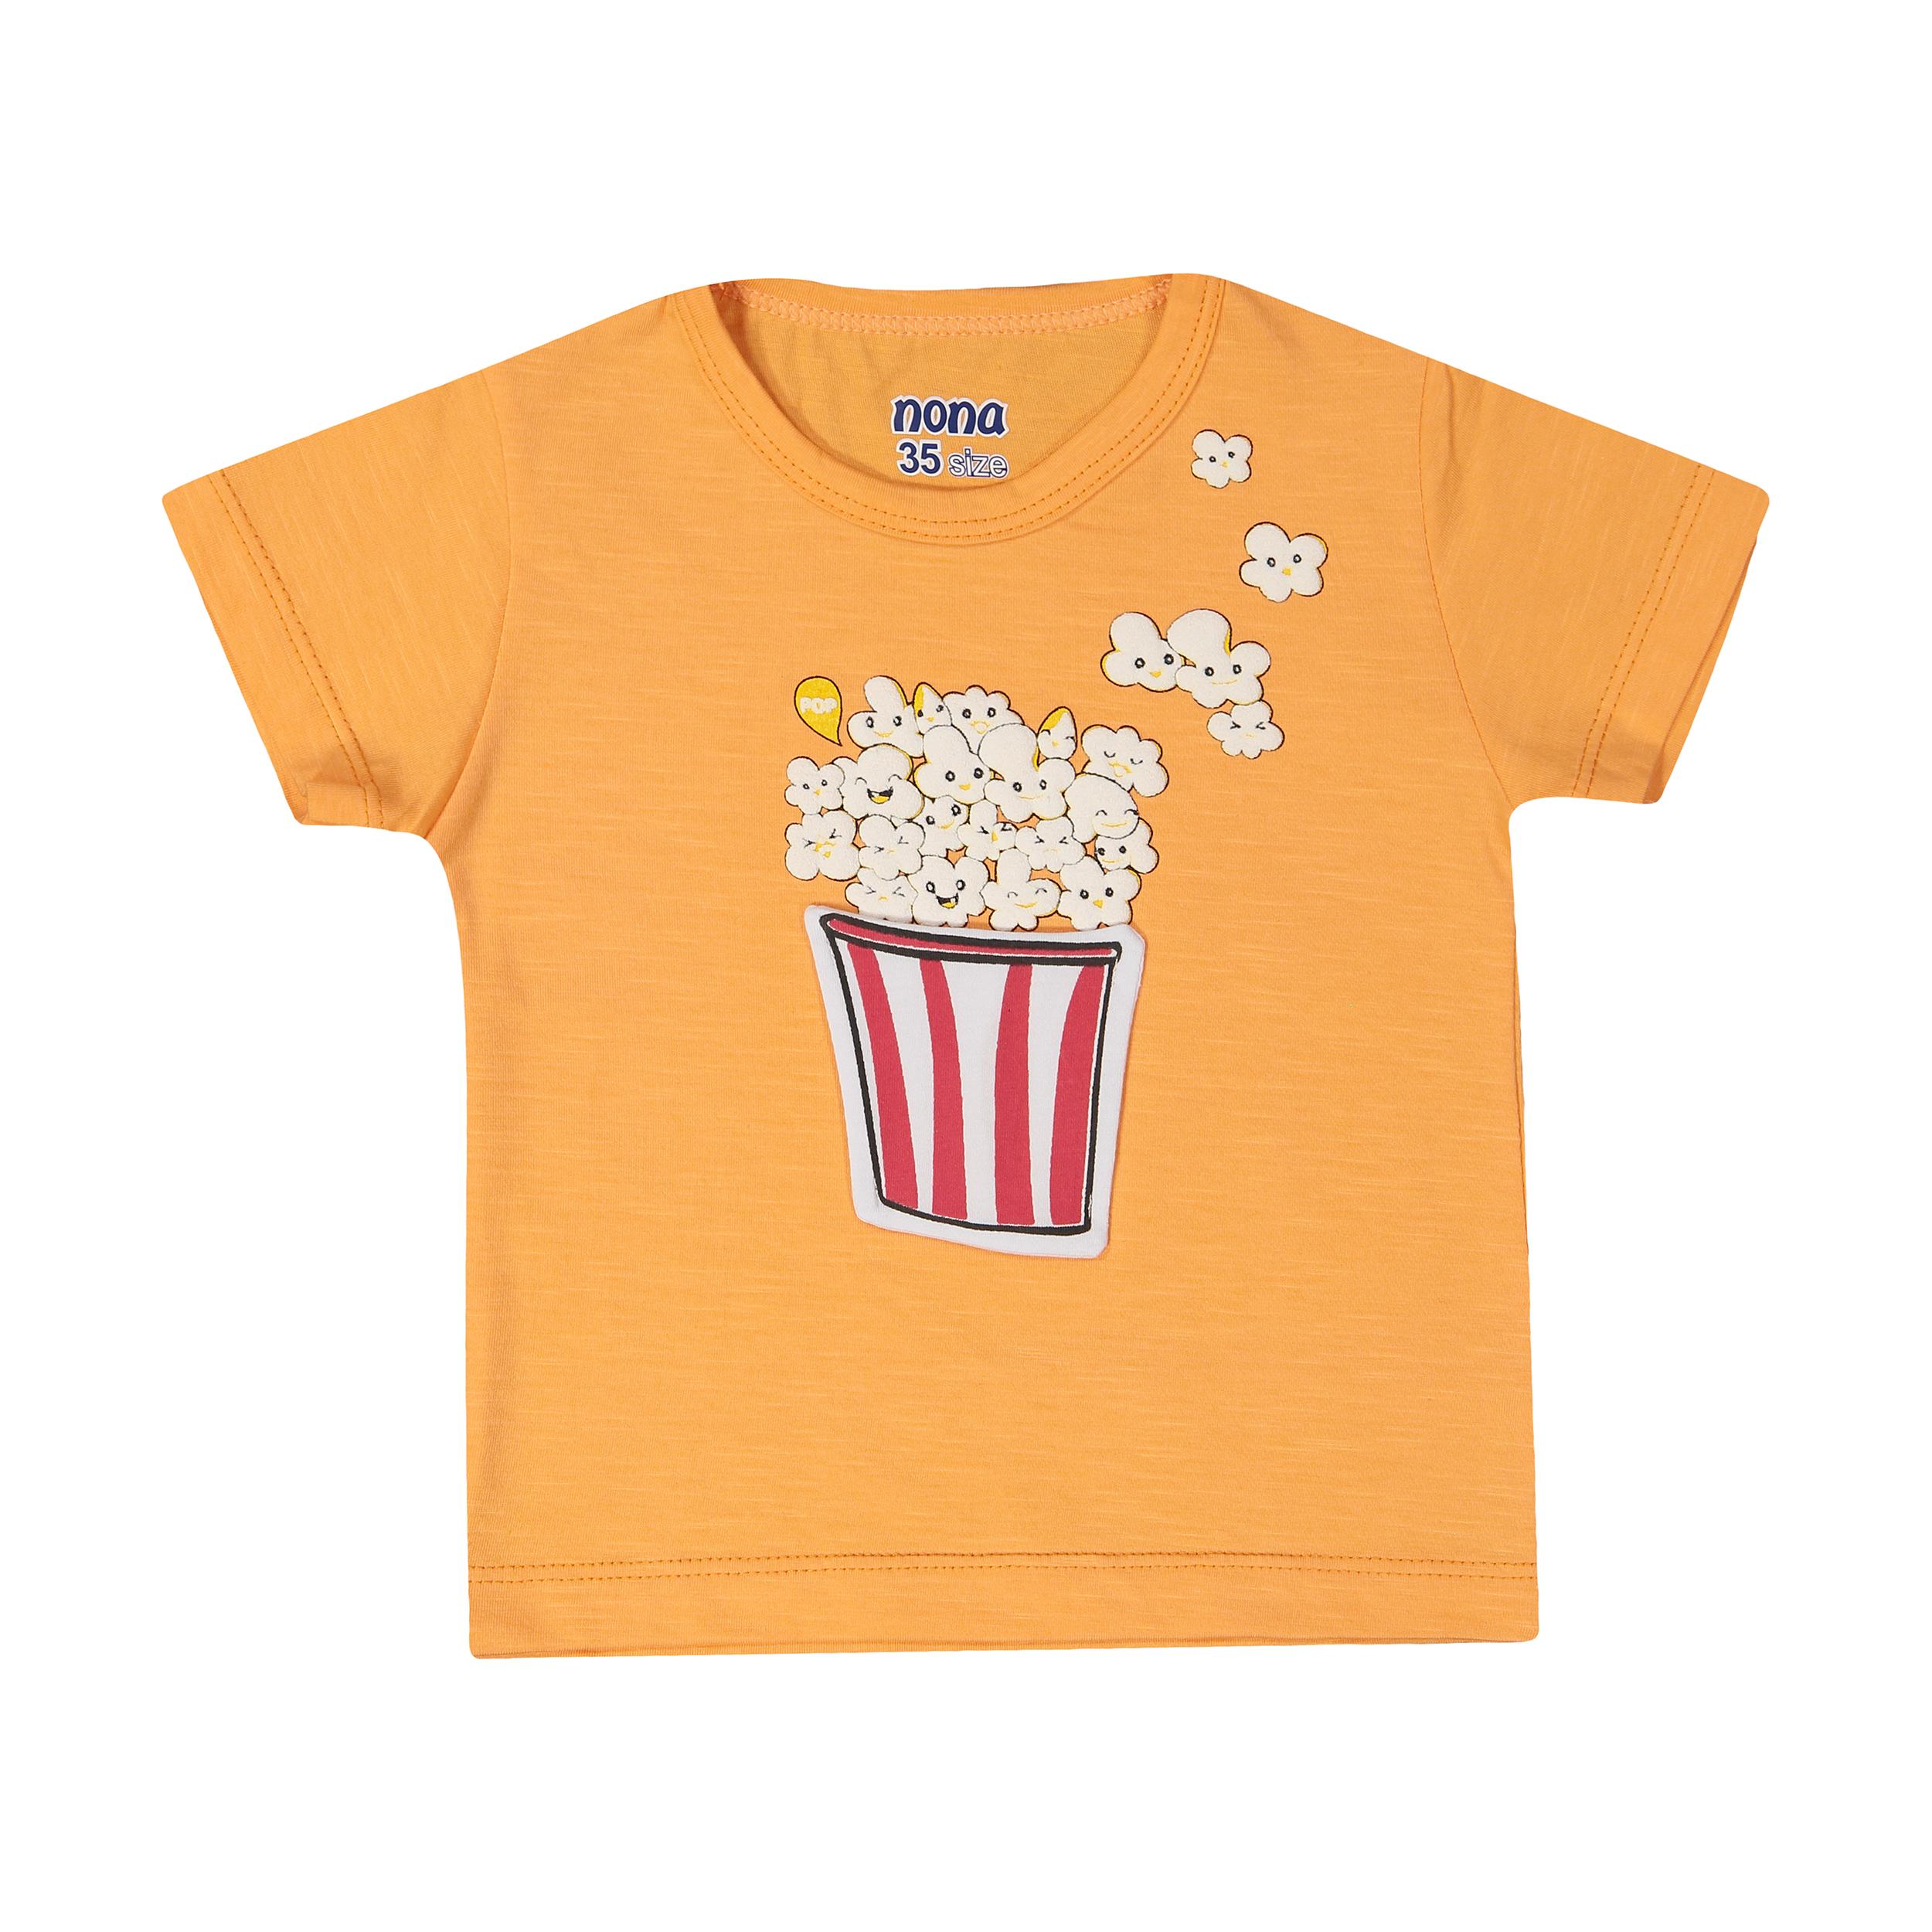 تی شرت پسرانه نونا مدل 2211116-23